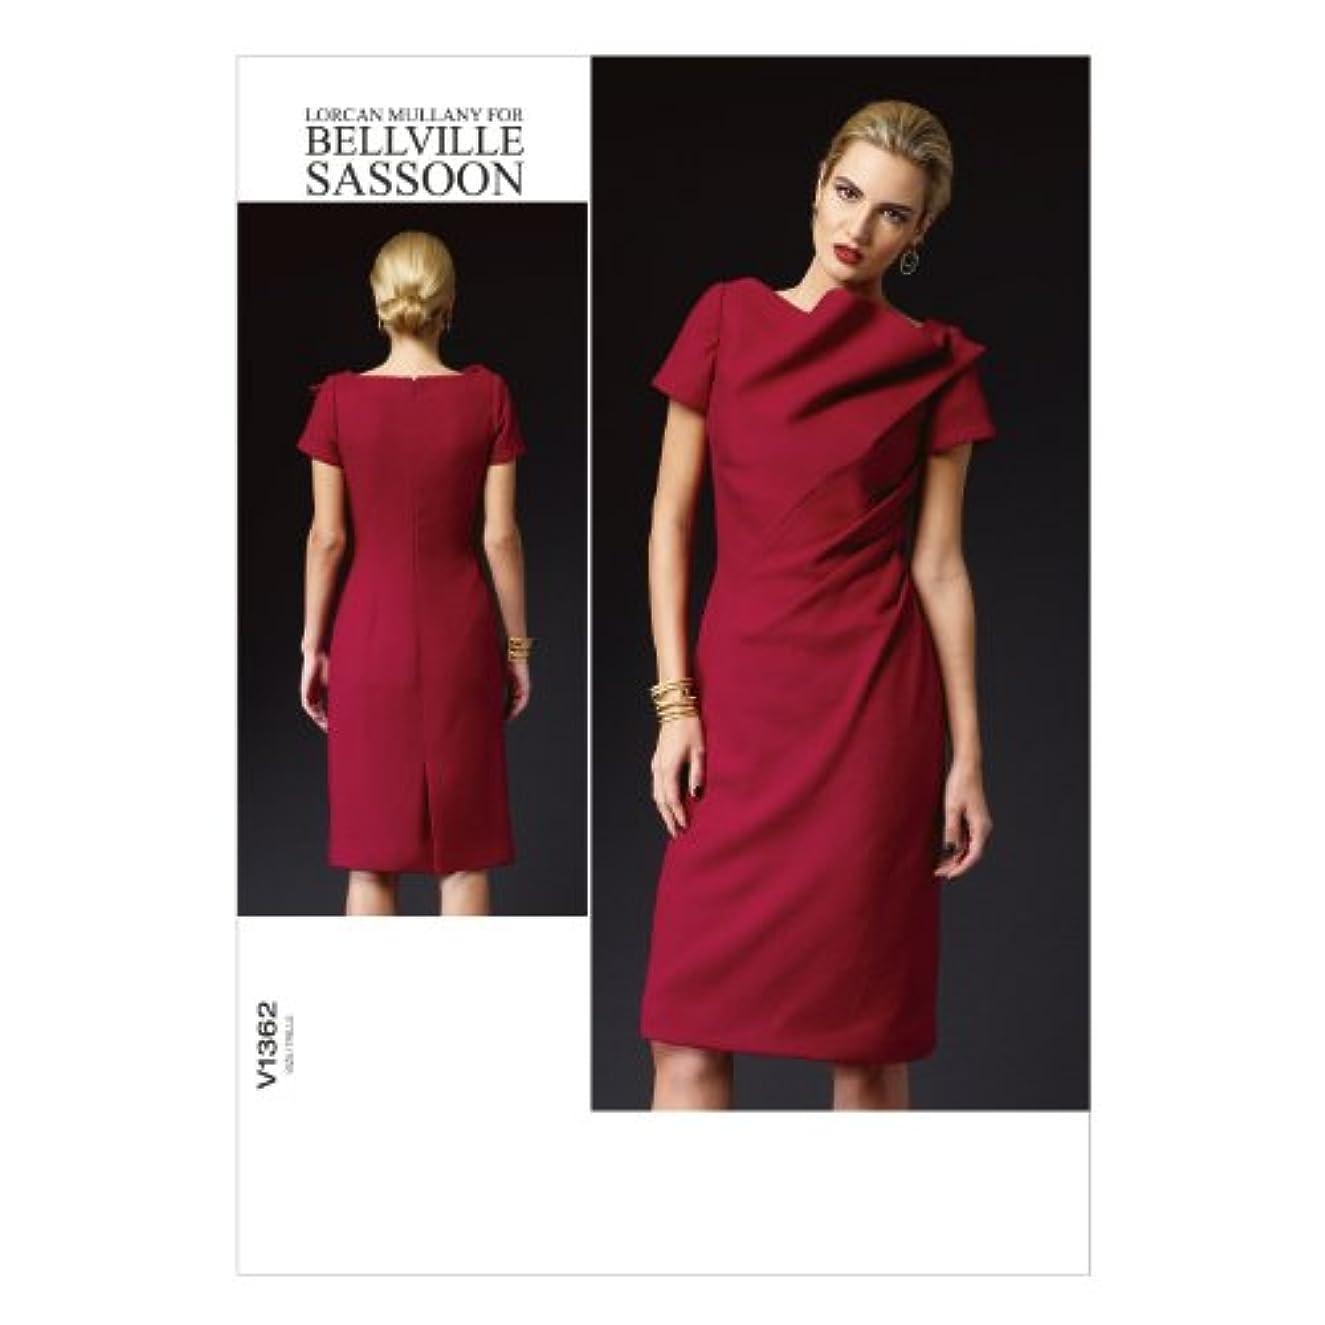 Vogue Patterns V1362 Misses' Dress Sewing Template, Size E5 (14-16-18-20-22)